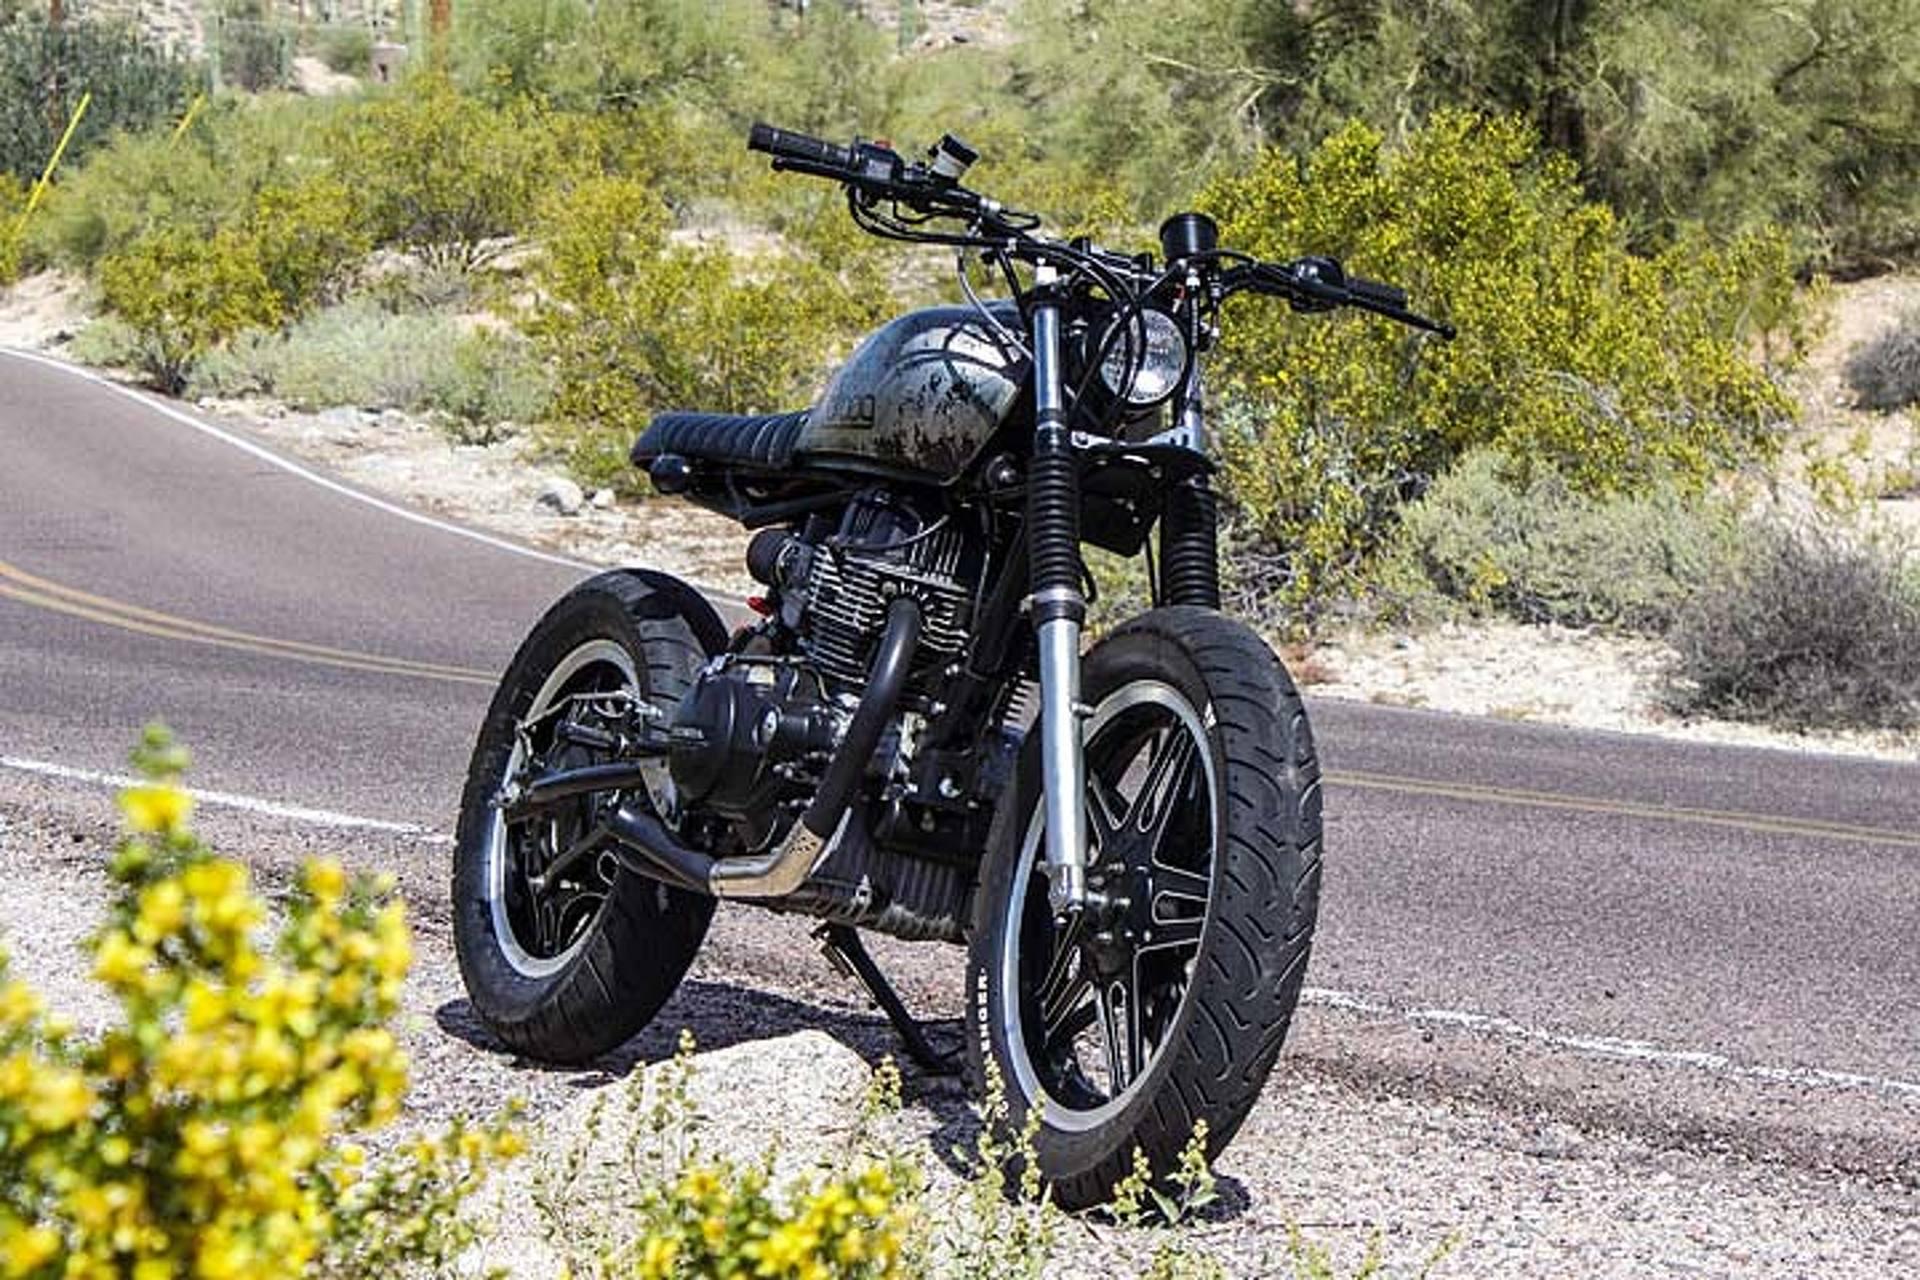 Droog Motos Honda Strambler Is Part Scrambler Part Street Tracker